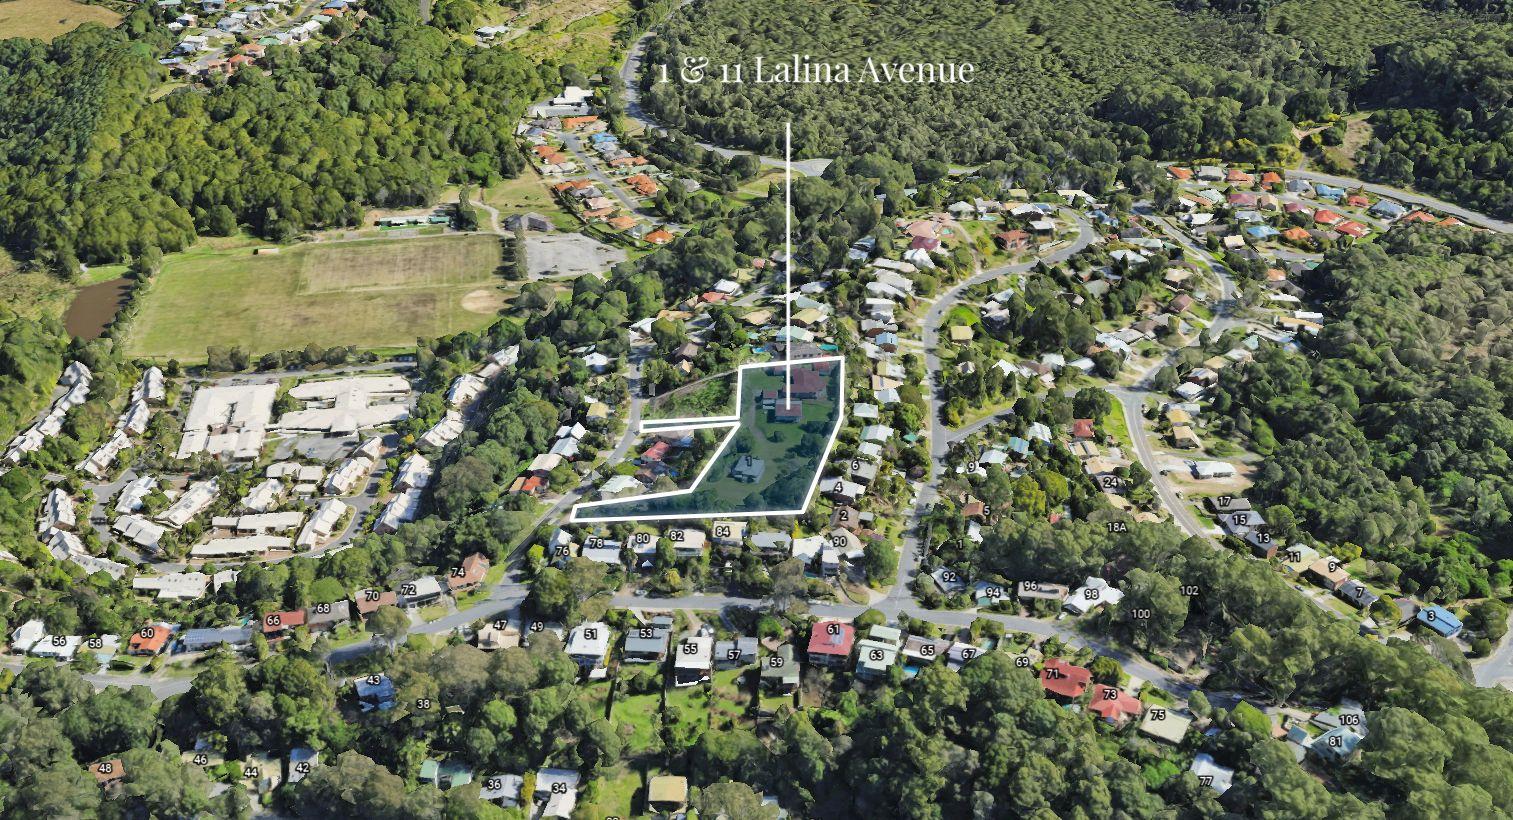 1 & 11 Lalina Avenue, Tweed Heads West NSW 2485, Image 0